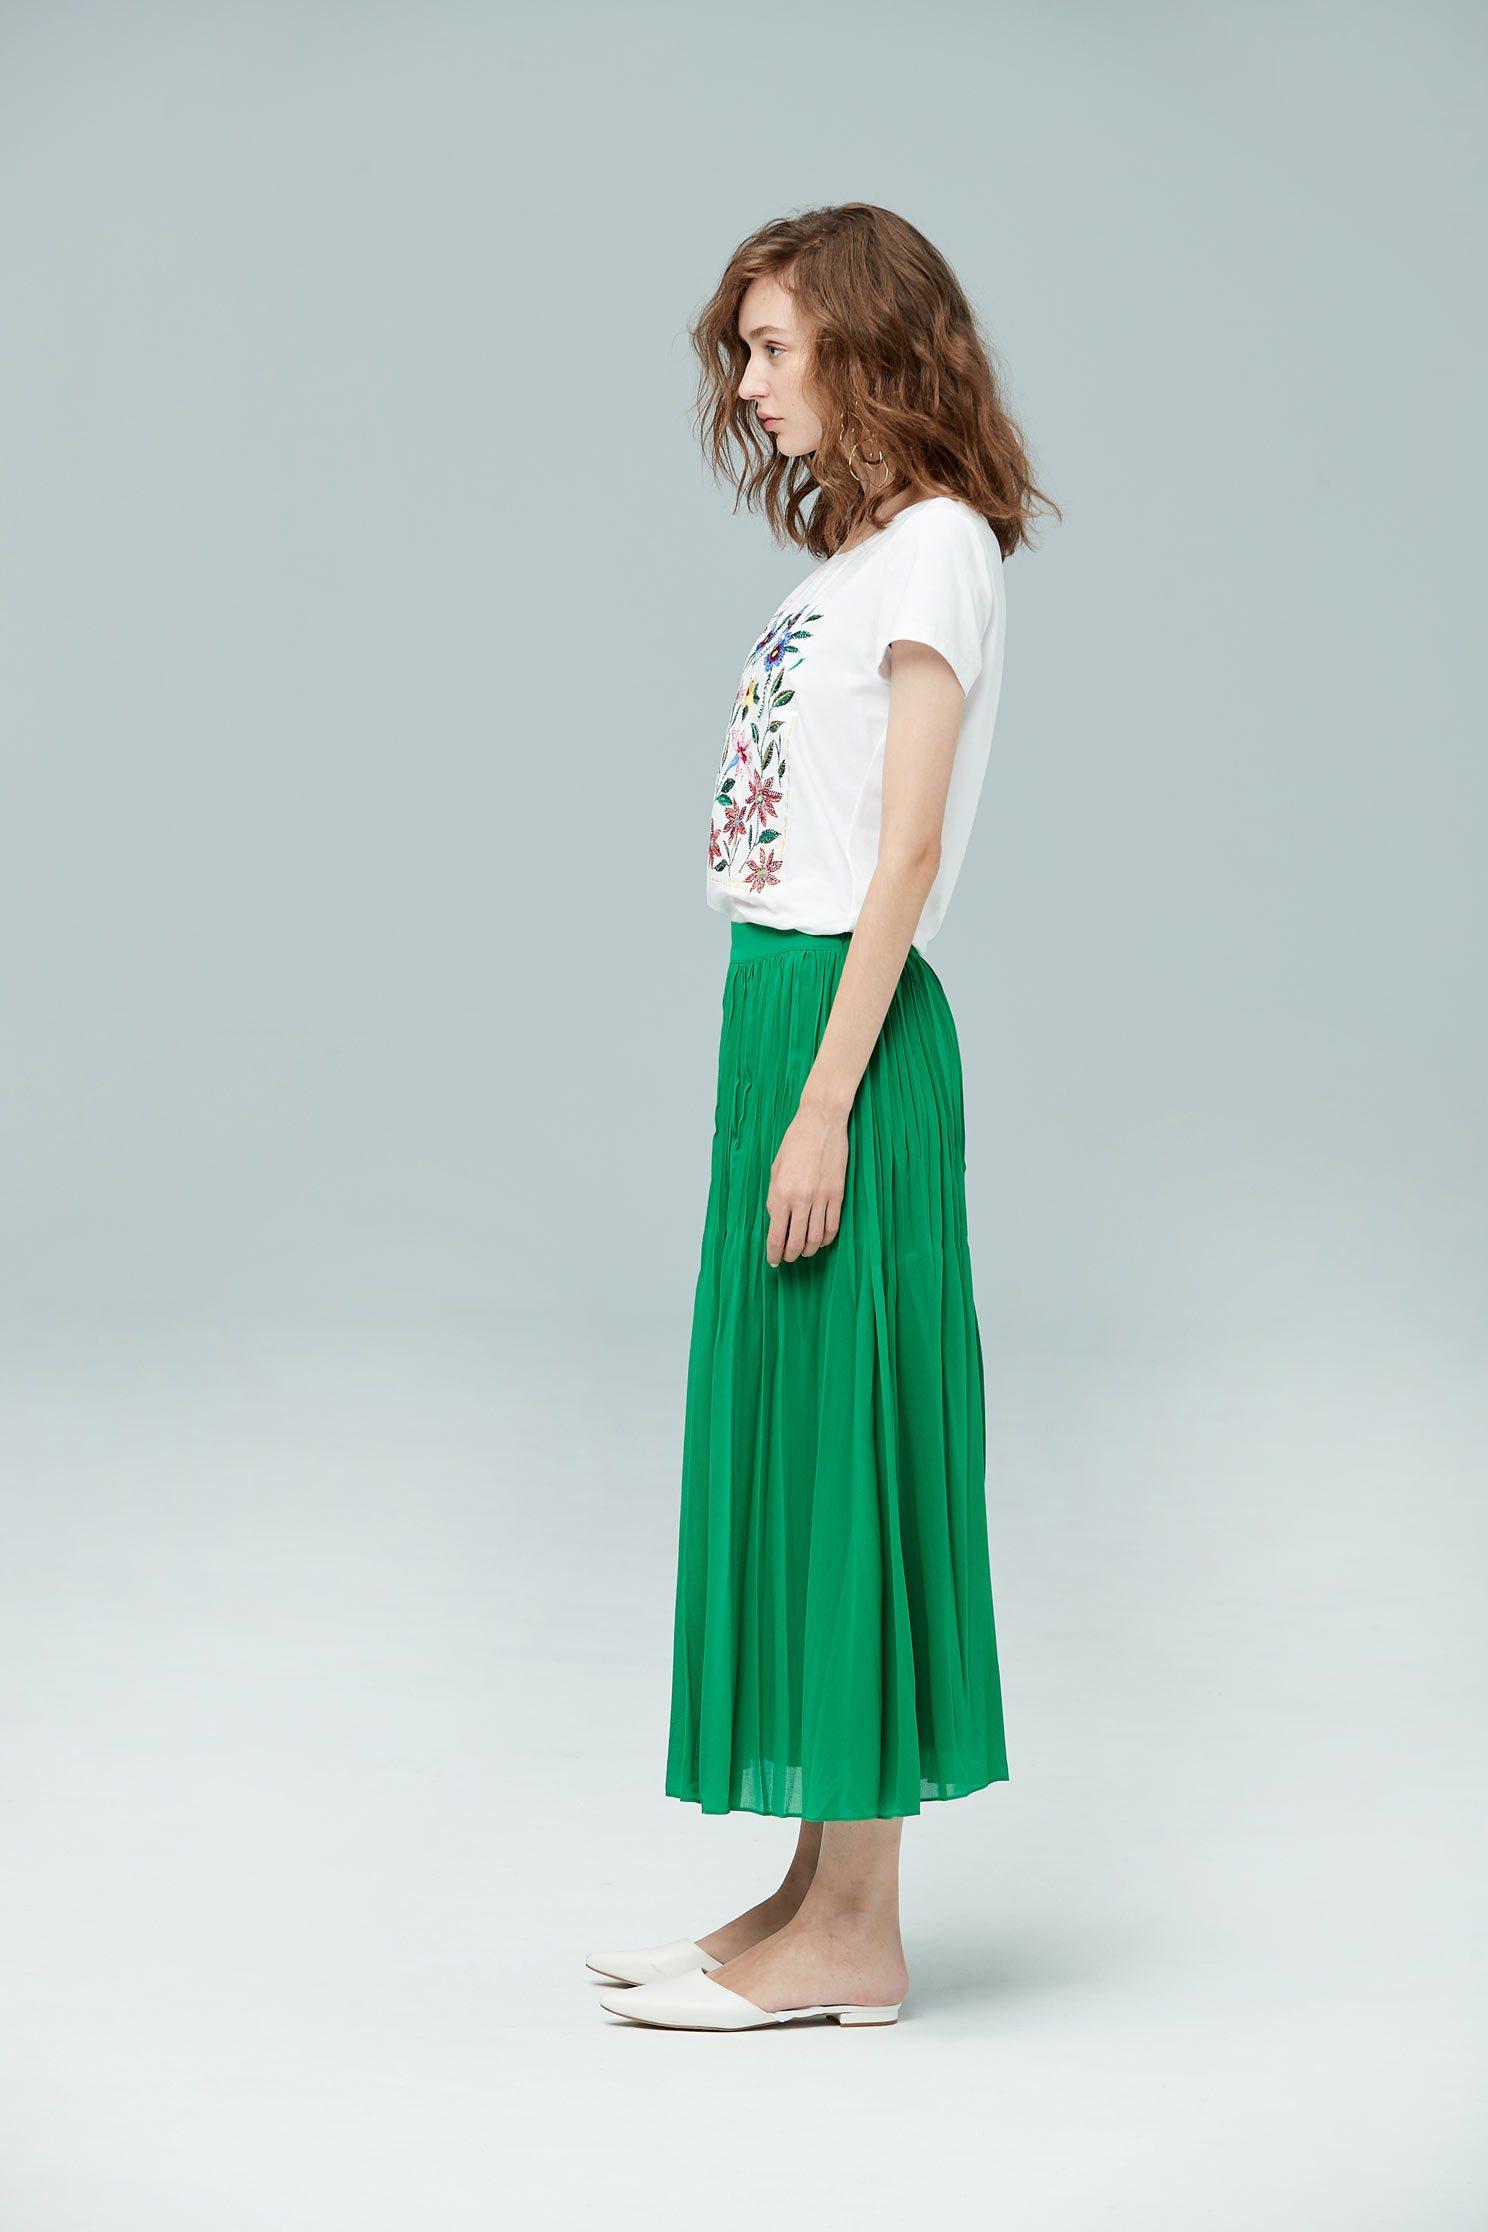 Wrinkled and elegant fashion skirt